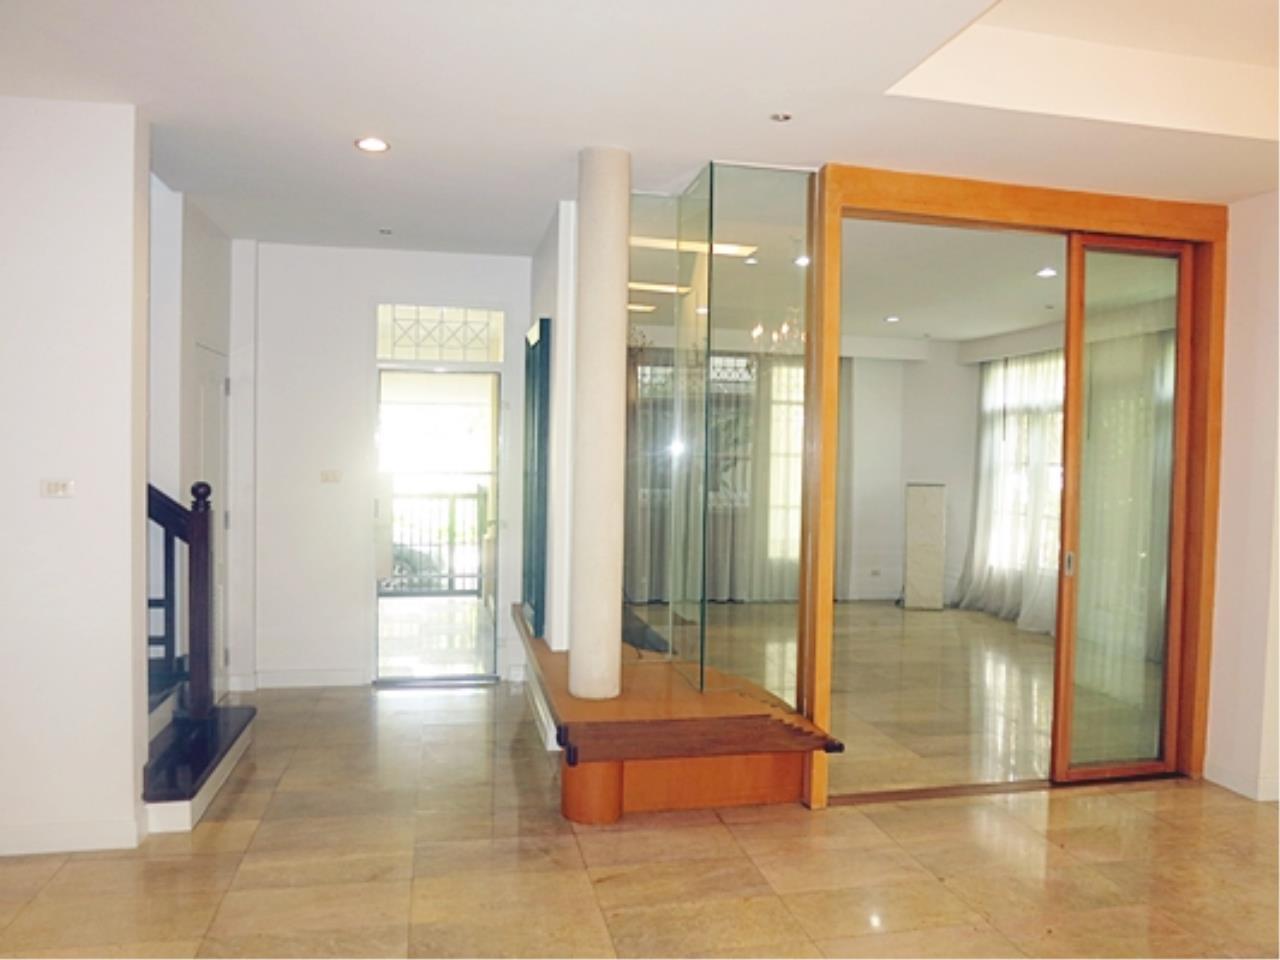 Estate Corner Agency (Samut Prakan) Agency's Single house for sale Ladprao, fully furnished. 5